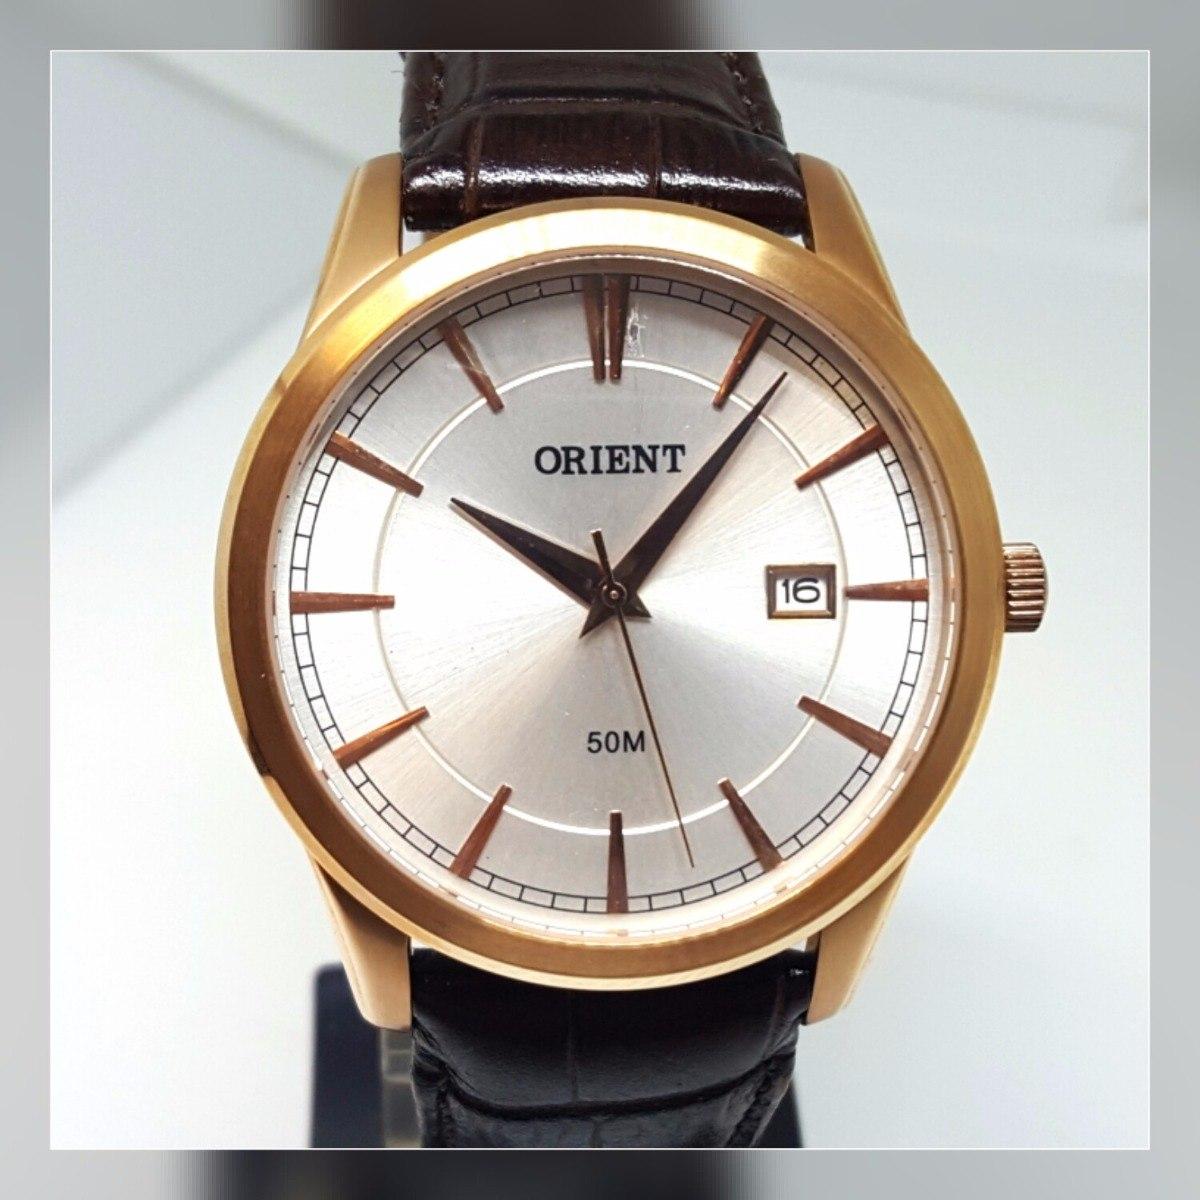 bcbee4aa56d relógio masculino clássico couro marrom aço rosê orient. Carregando zoom.